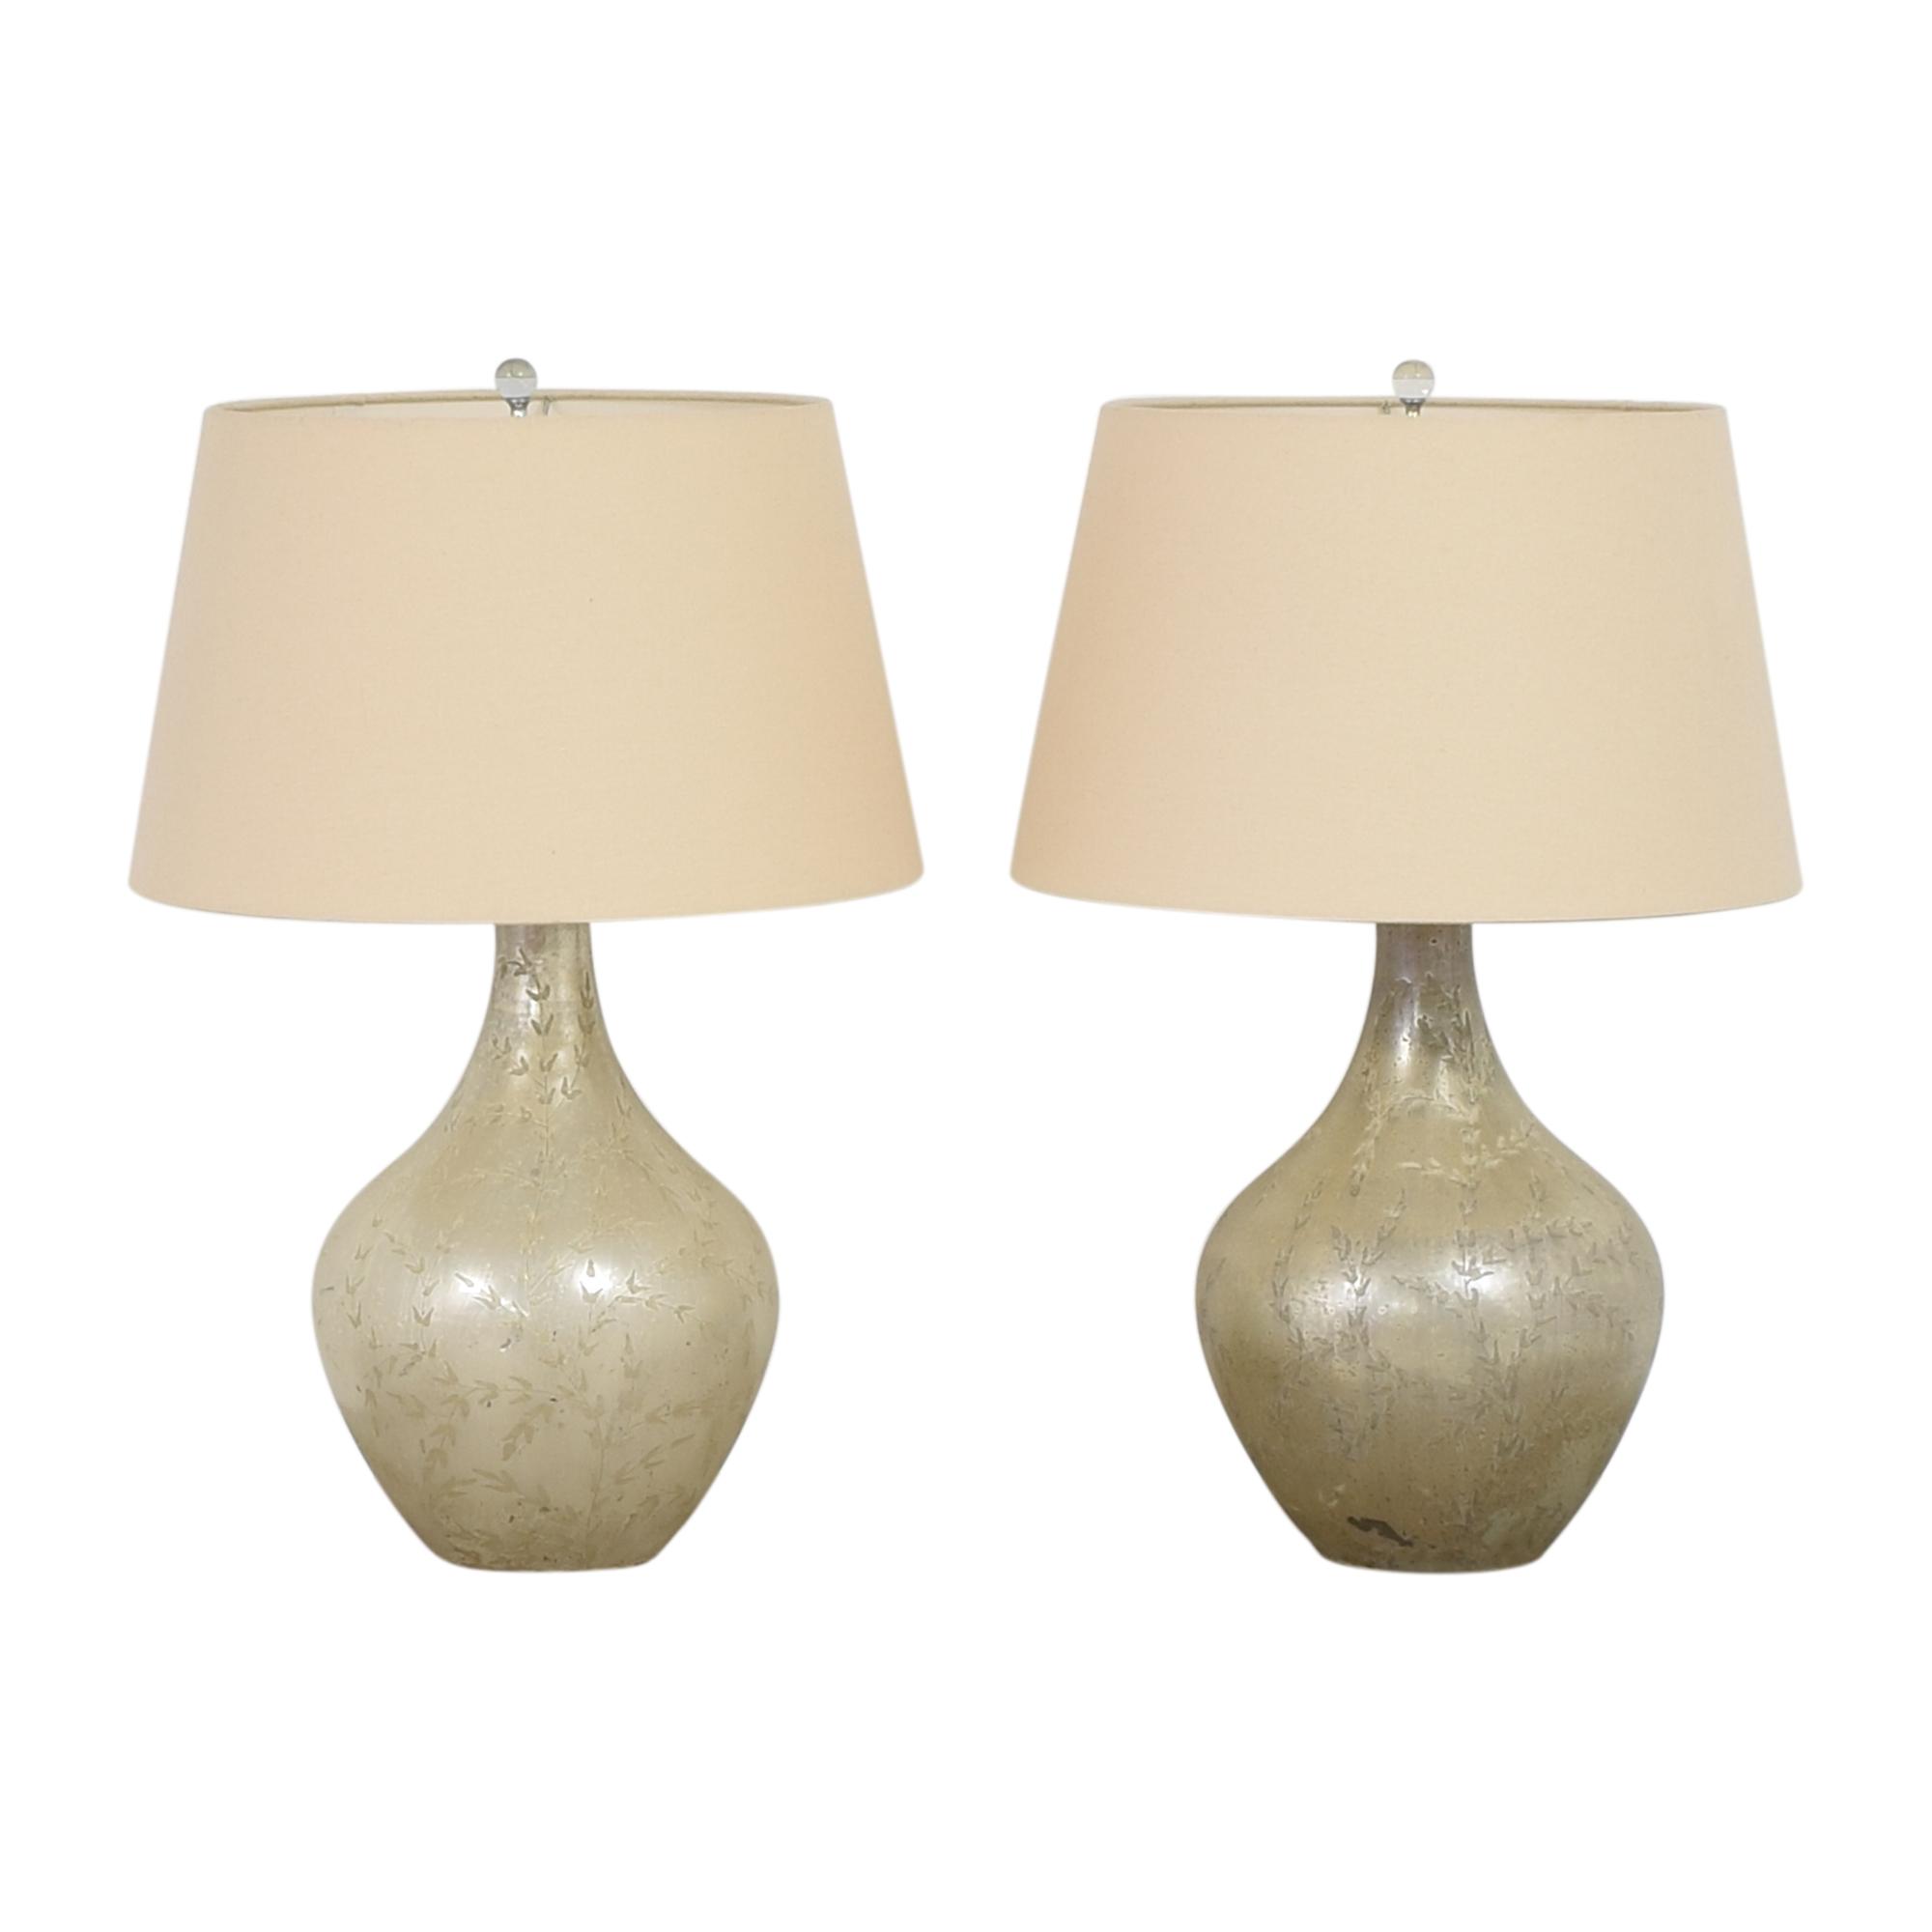 shop Tanner & Kenzie Bedside Table Lamps Tanner & Kenzie Lamps